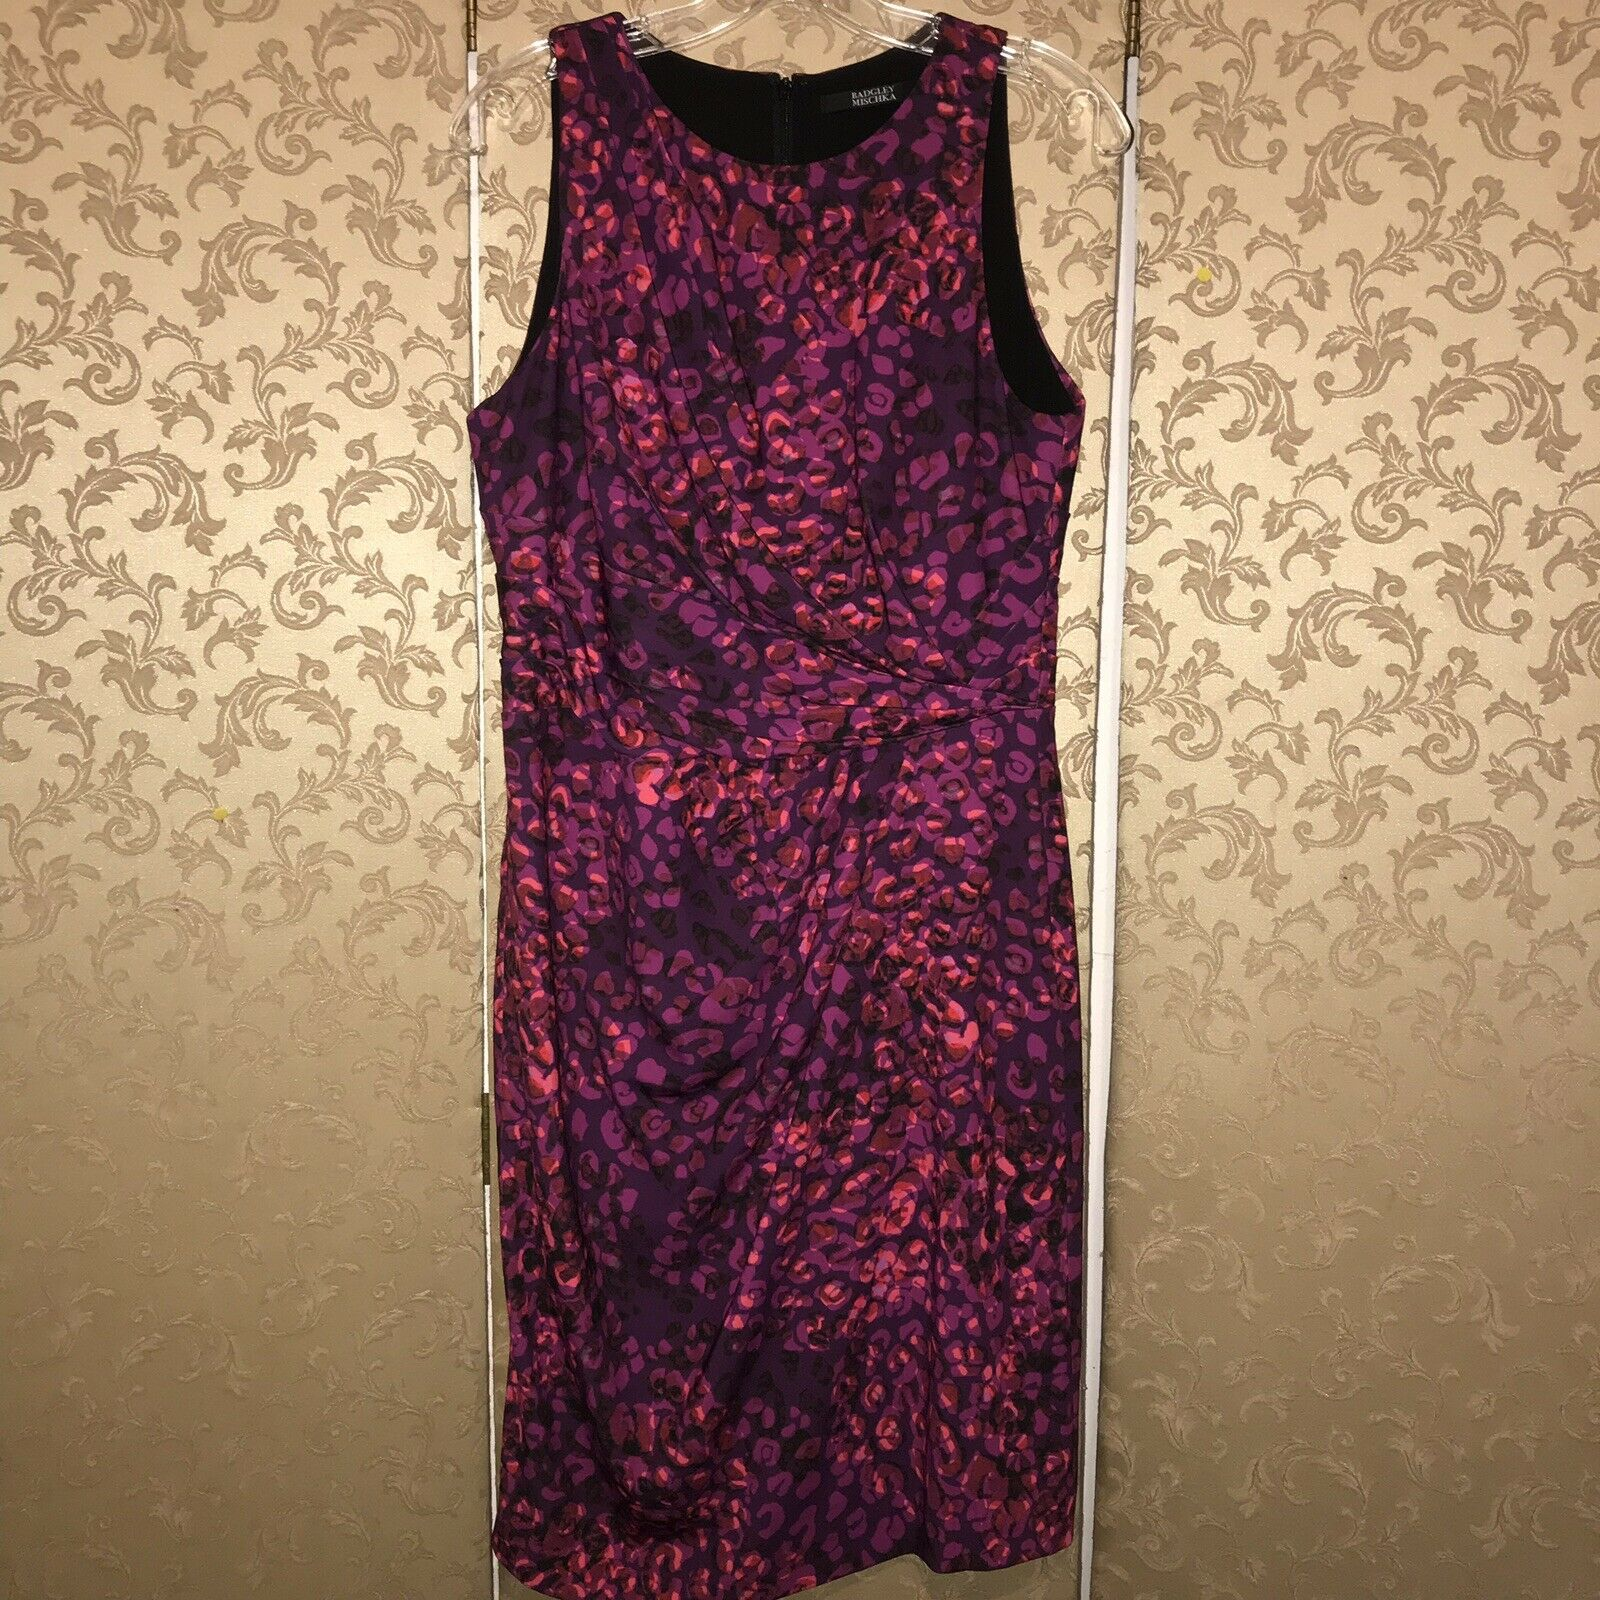 Badgley Mischka Purple Pink Multi-color Sleeveless Sheath Dress 10